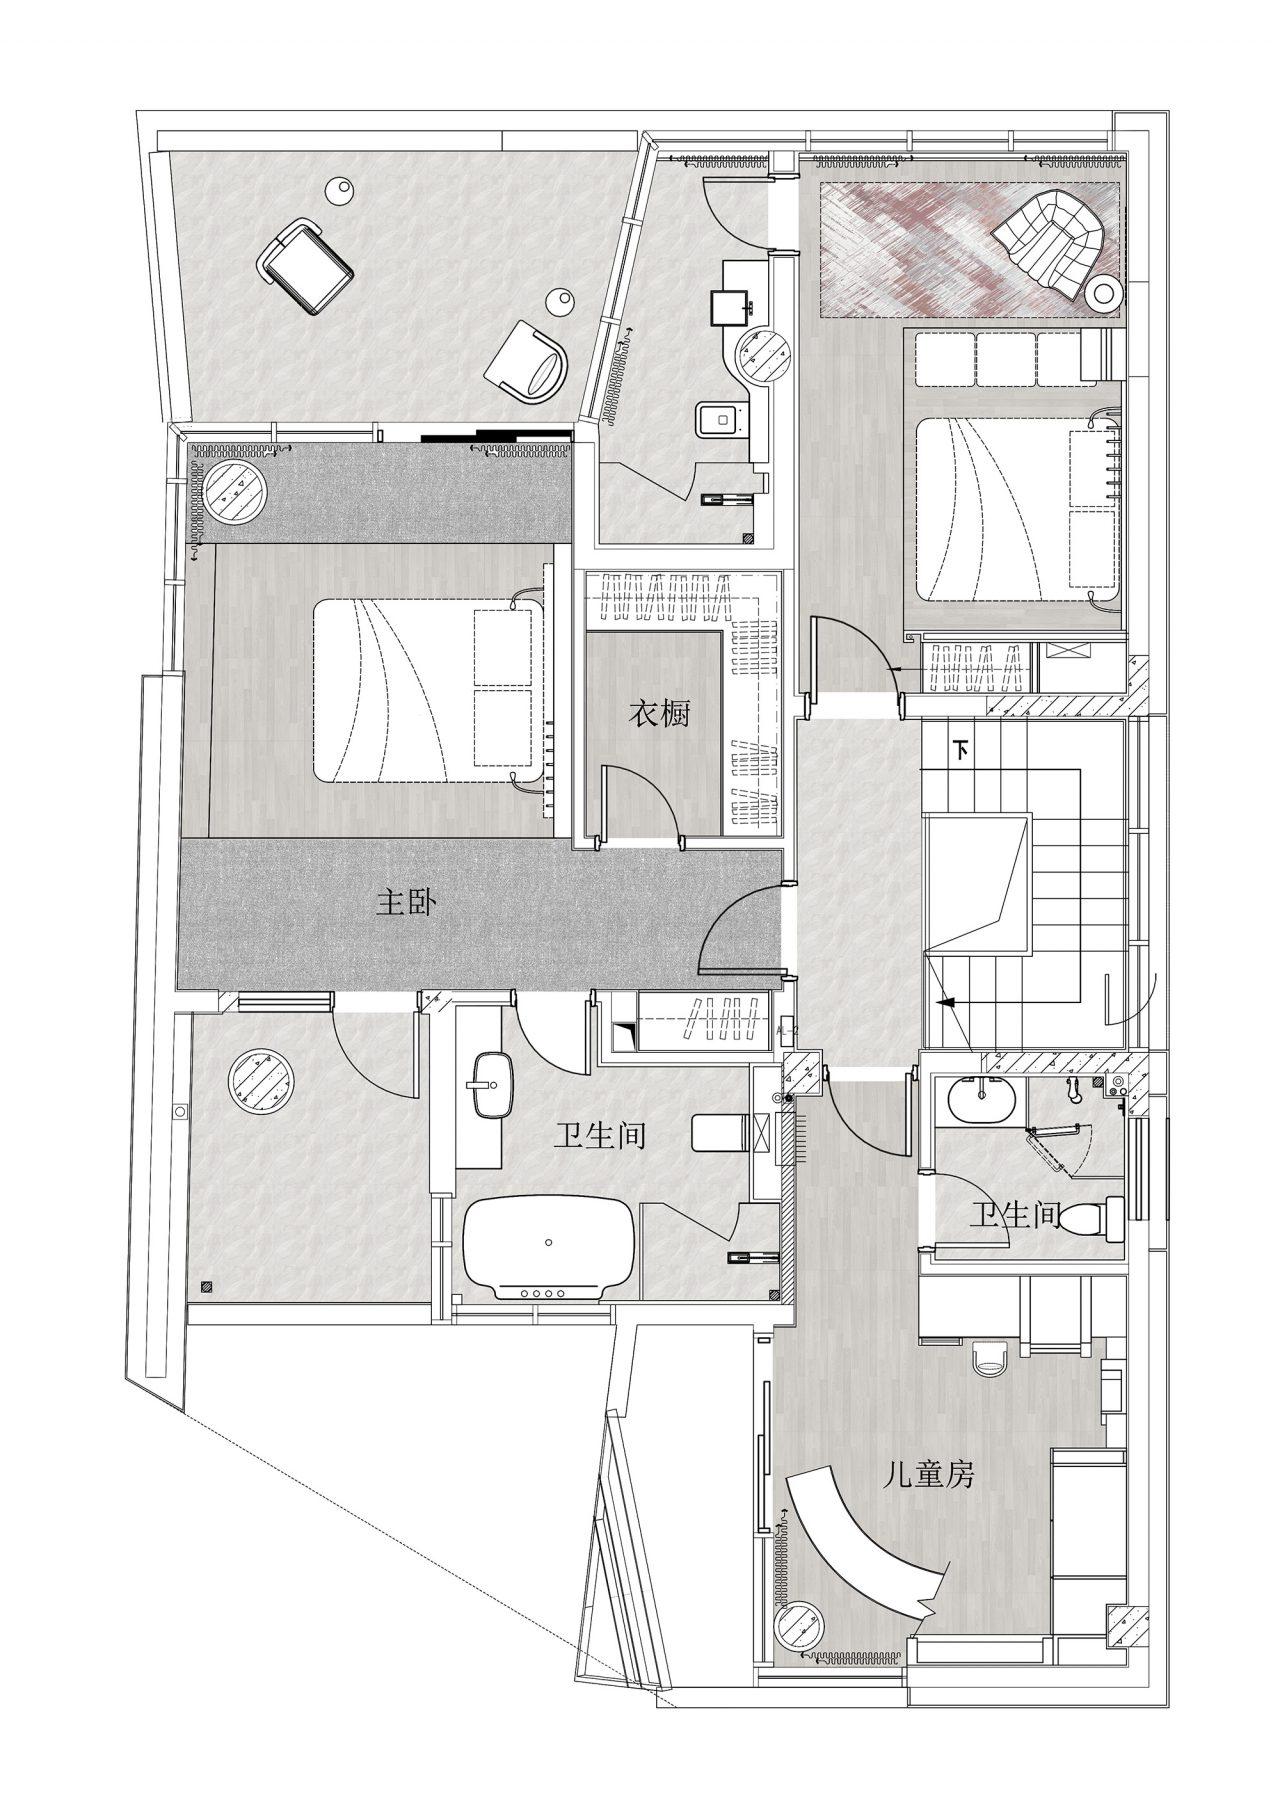 I:镸飞14.éºfi湌怷暿銴cad2c Model